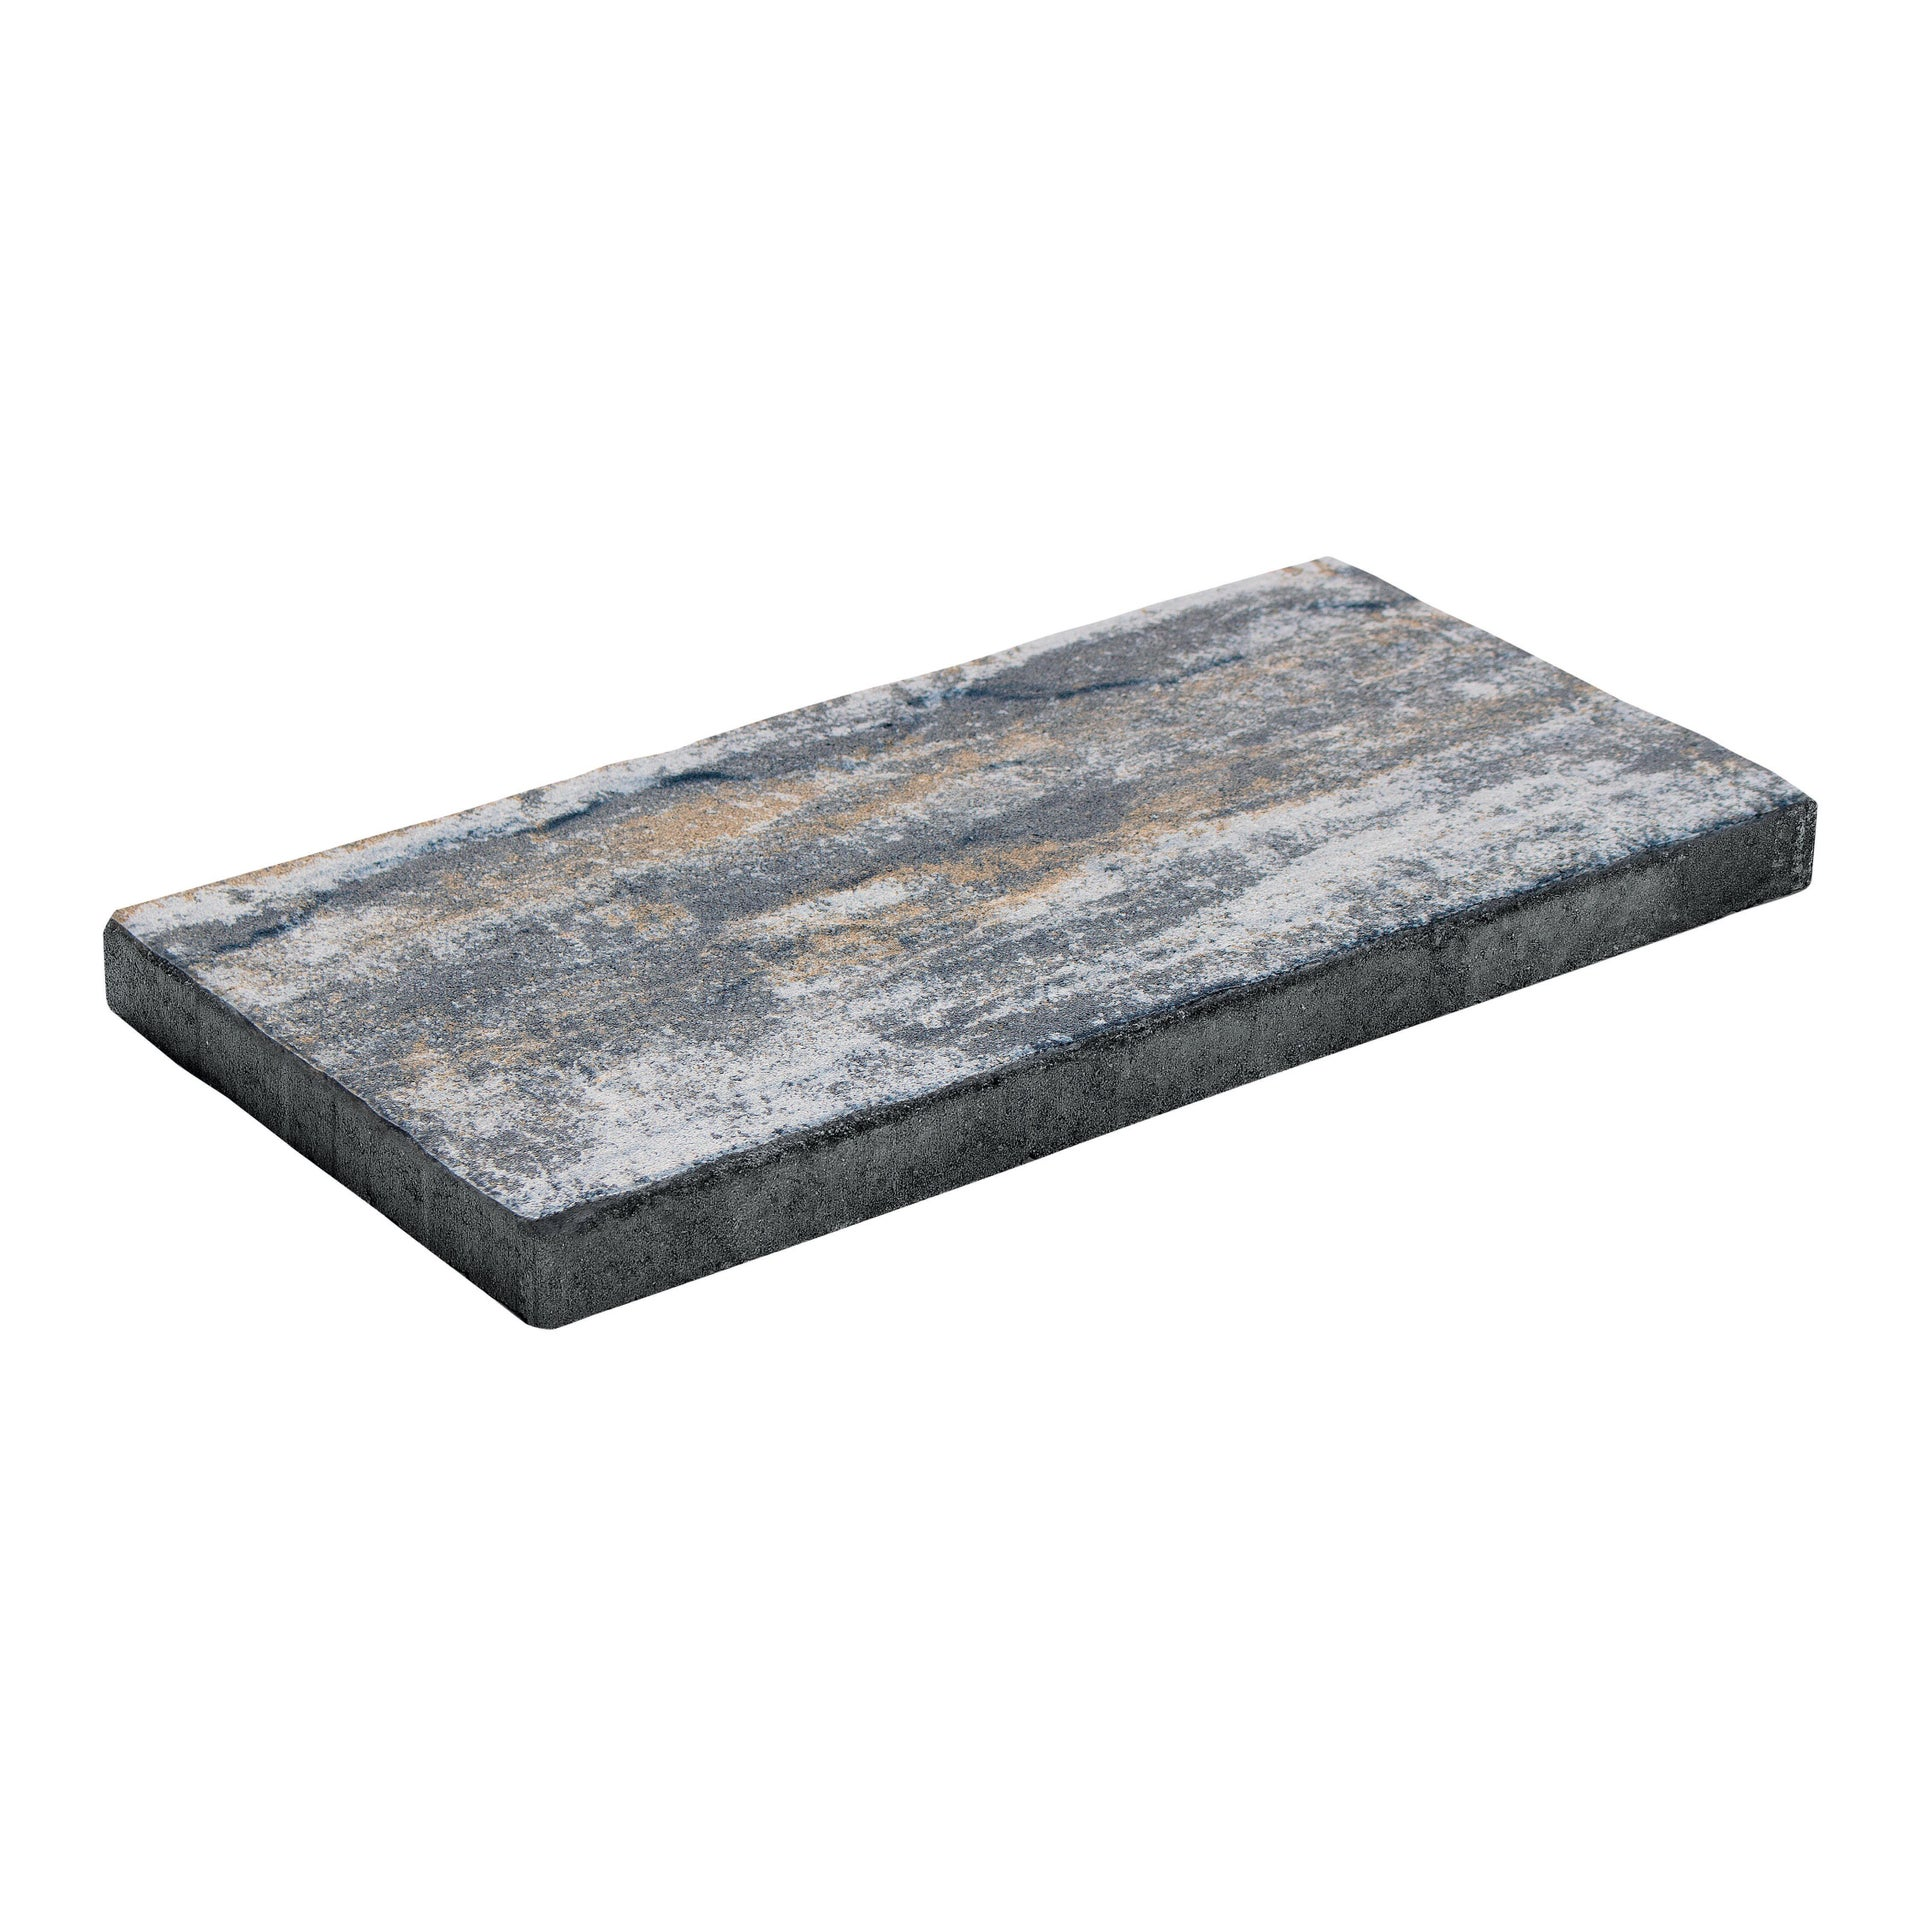 Passo giapponese in pietra ricostituita LASTRA LATINA MIX LUSERNA 24 x 3 cm - 1